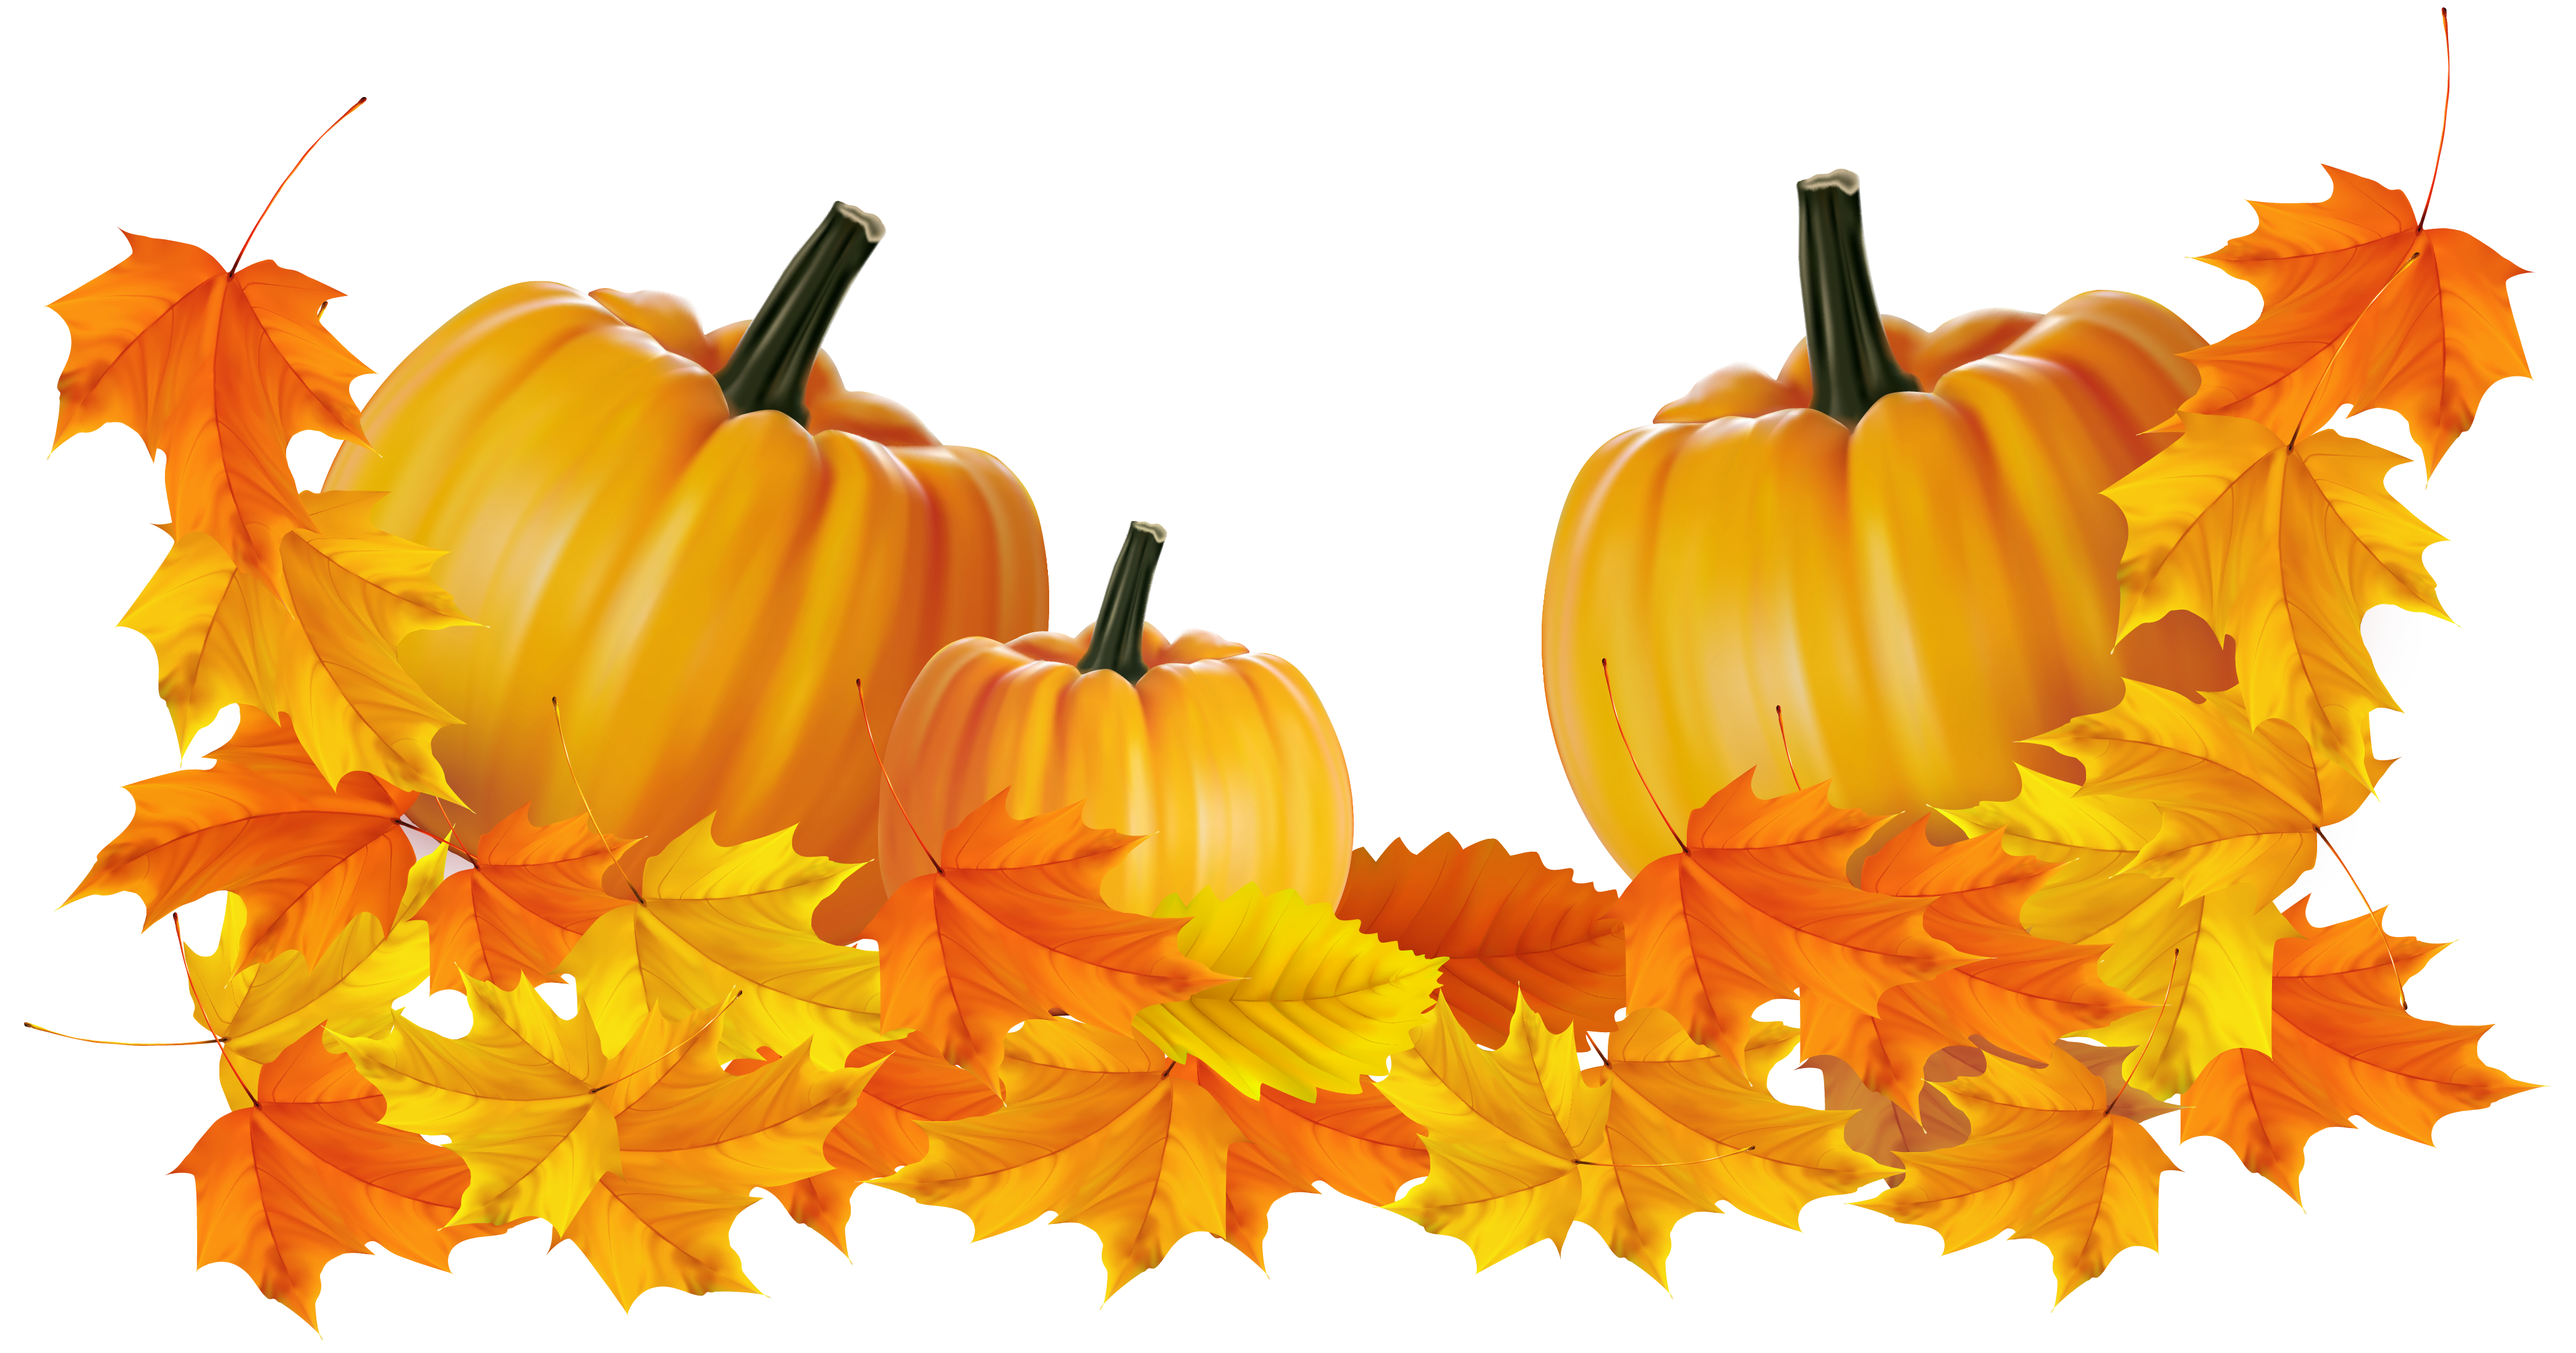 Transparent pumpkin decor clipart. Thanksgiving border png